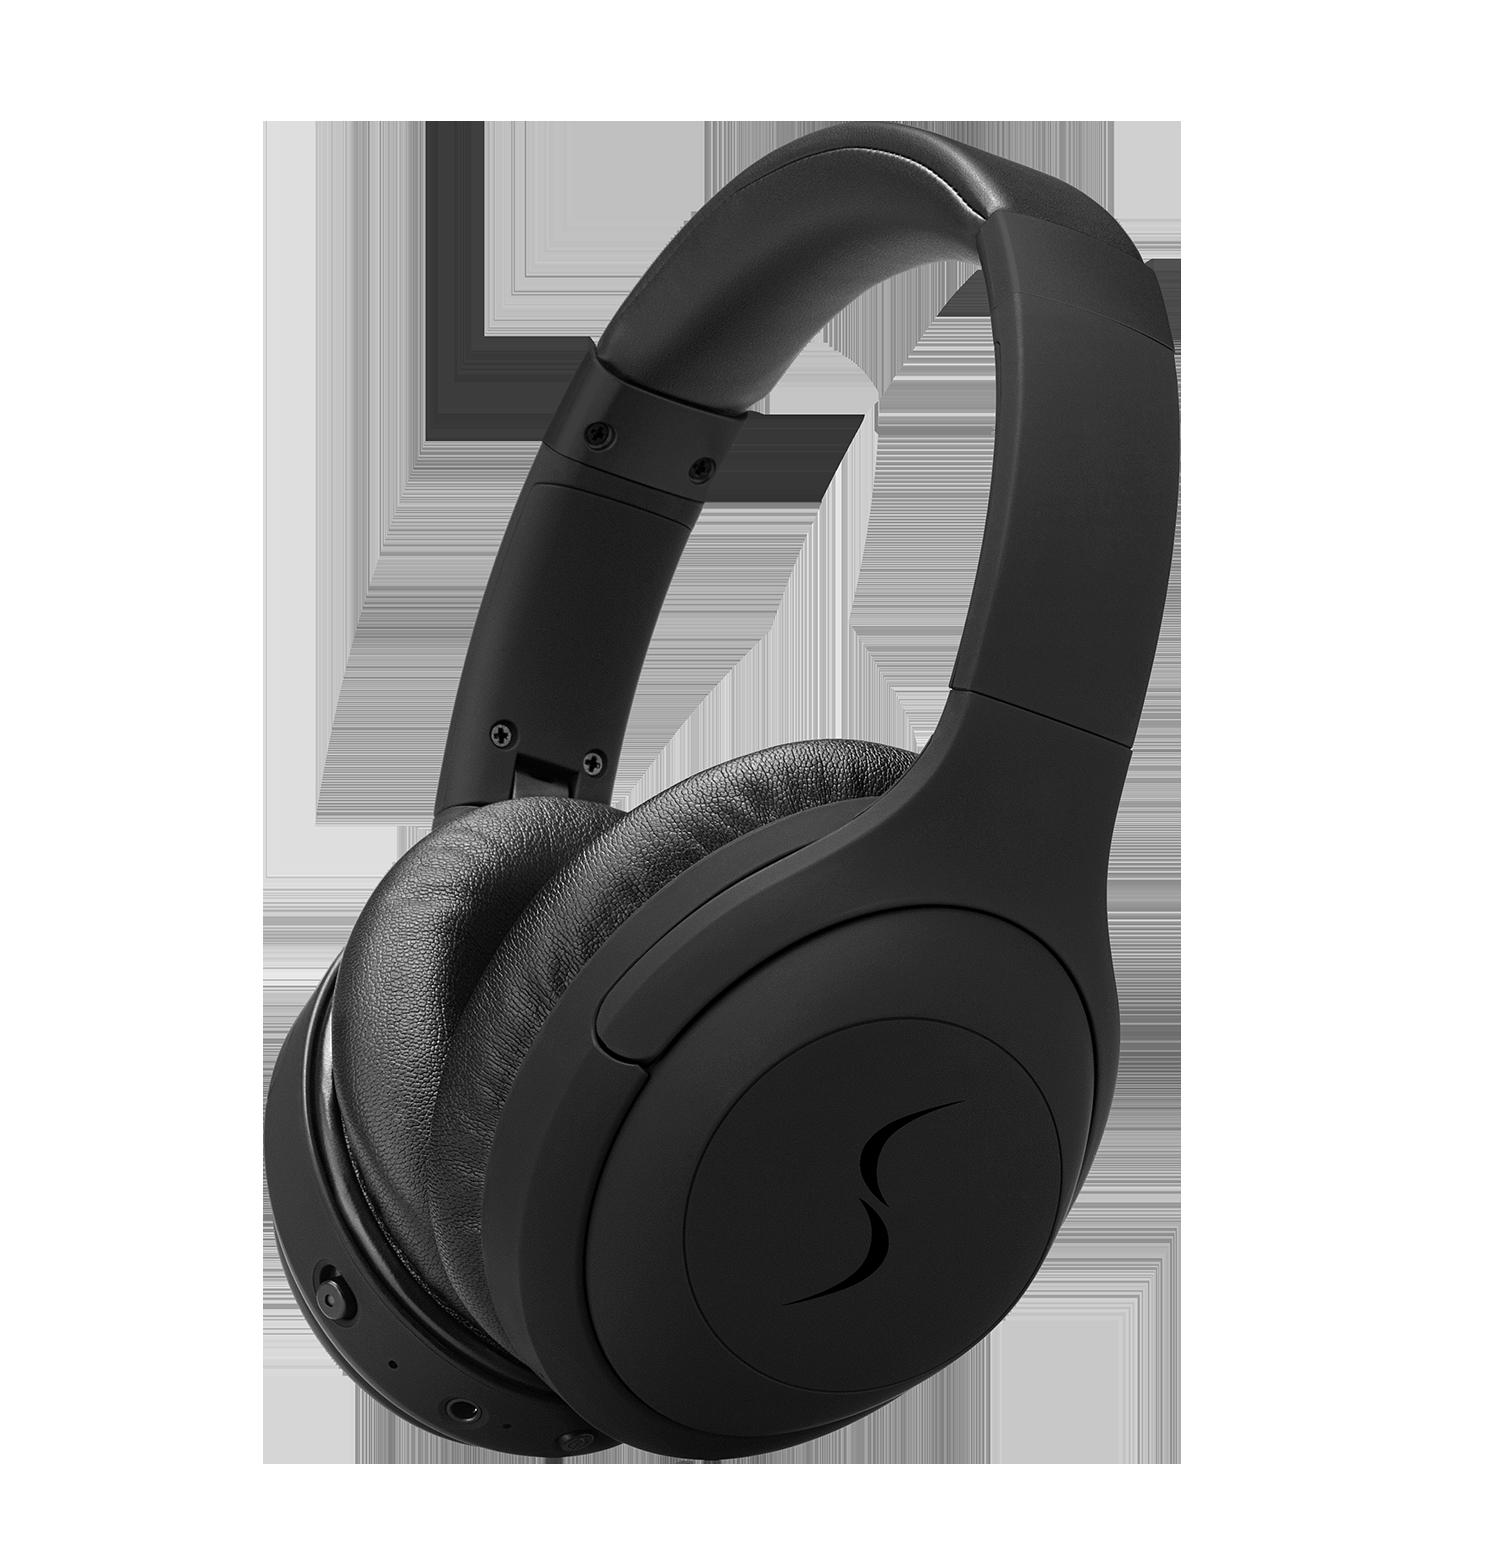 NiTRO-X Over ear anc